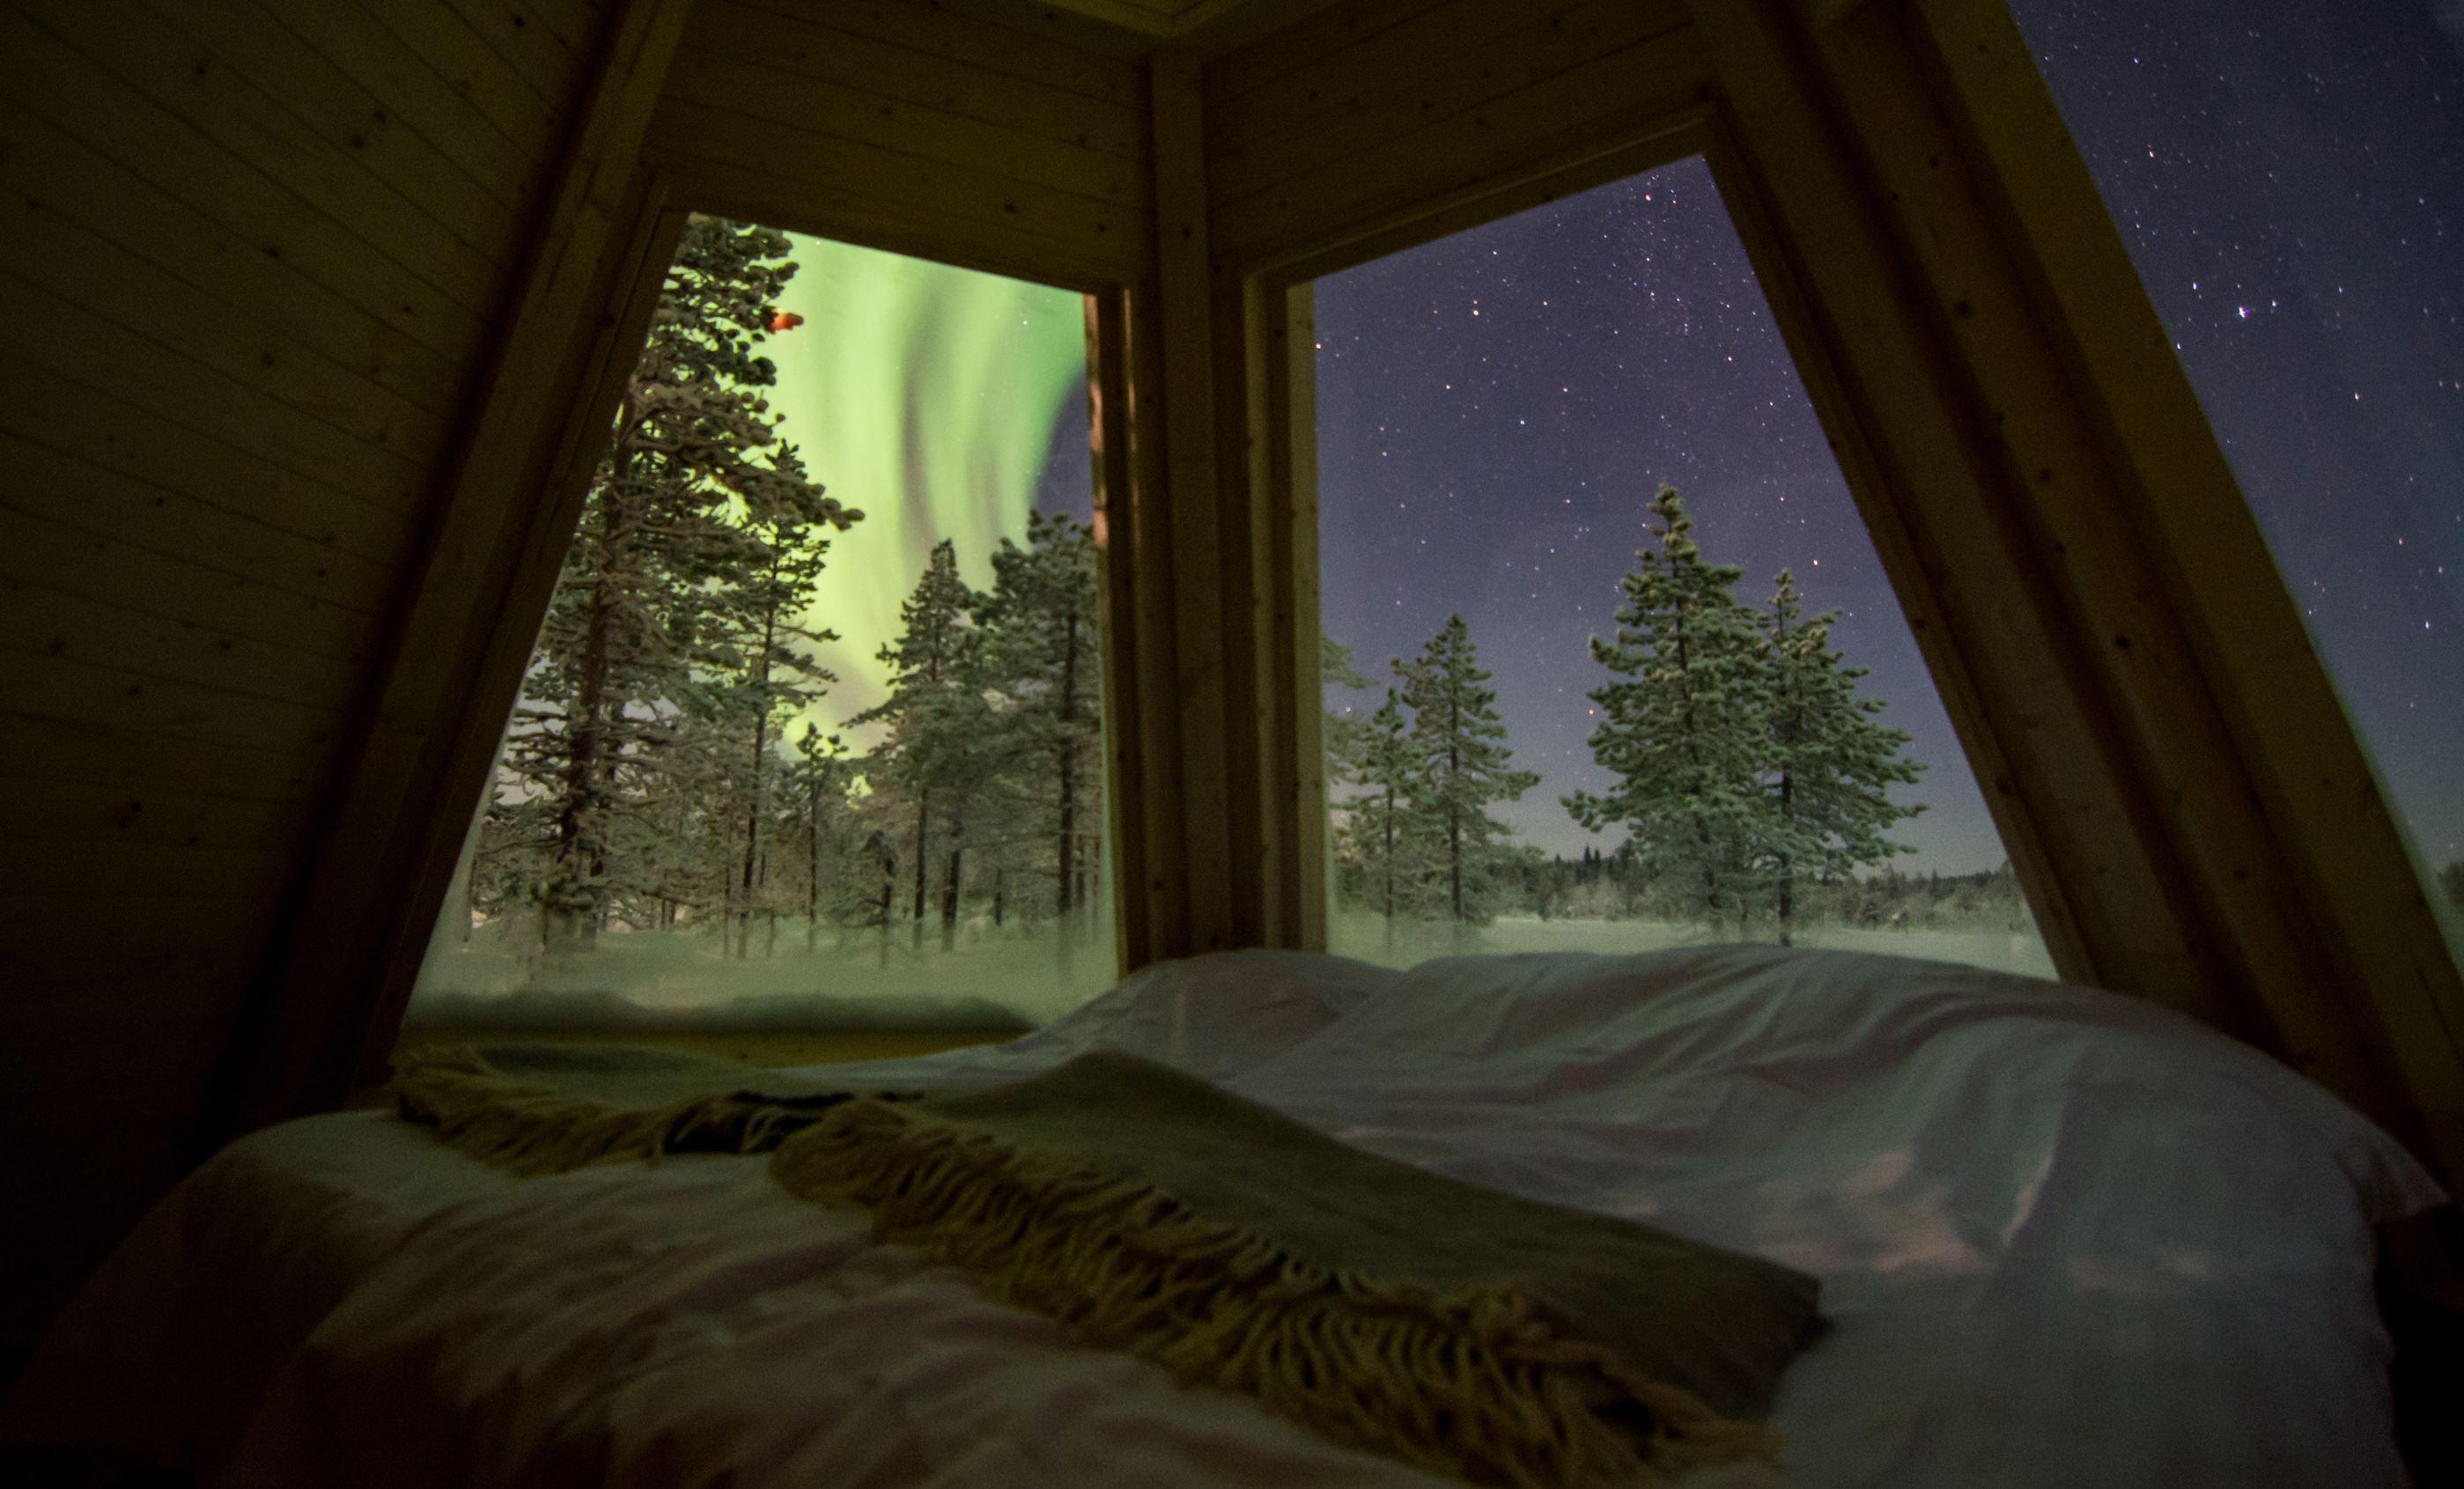 Foto Explore the North,  © Aurora Borealis Adventure, Övernattning i norrskenskåta